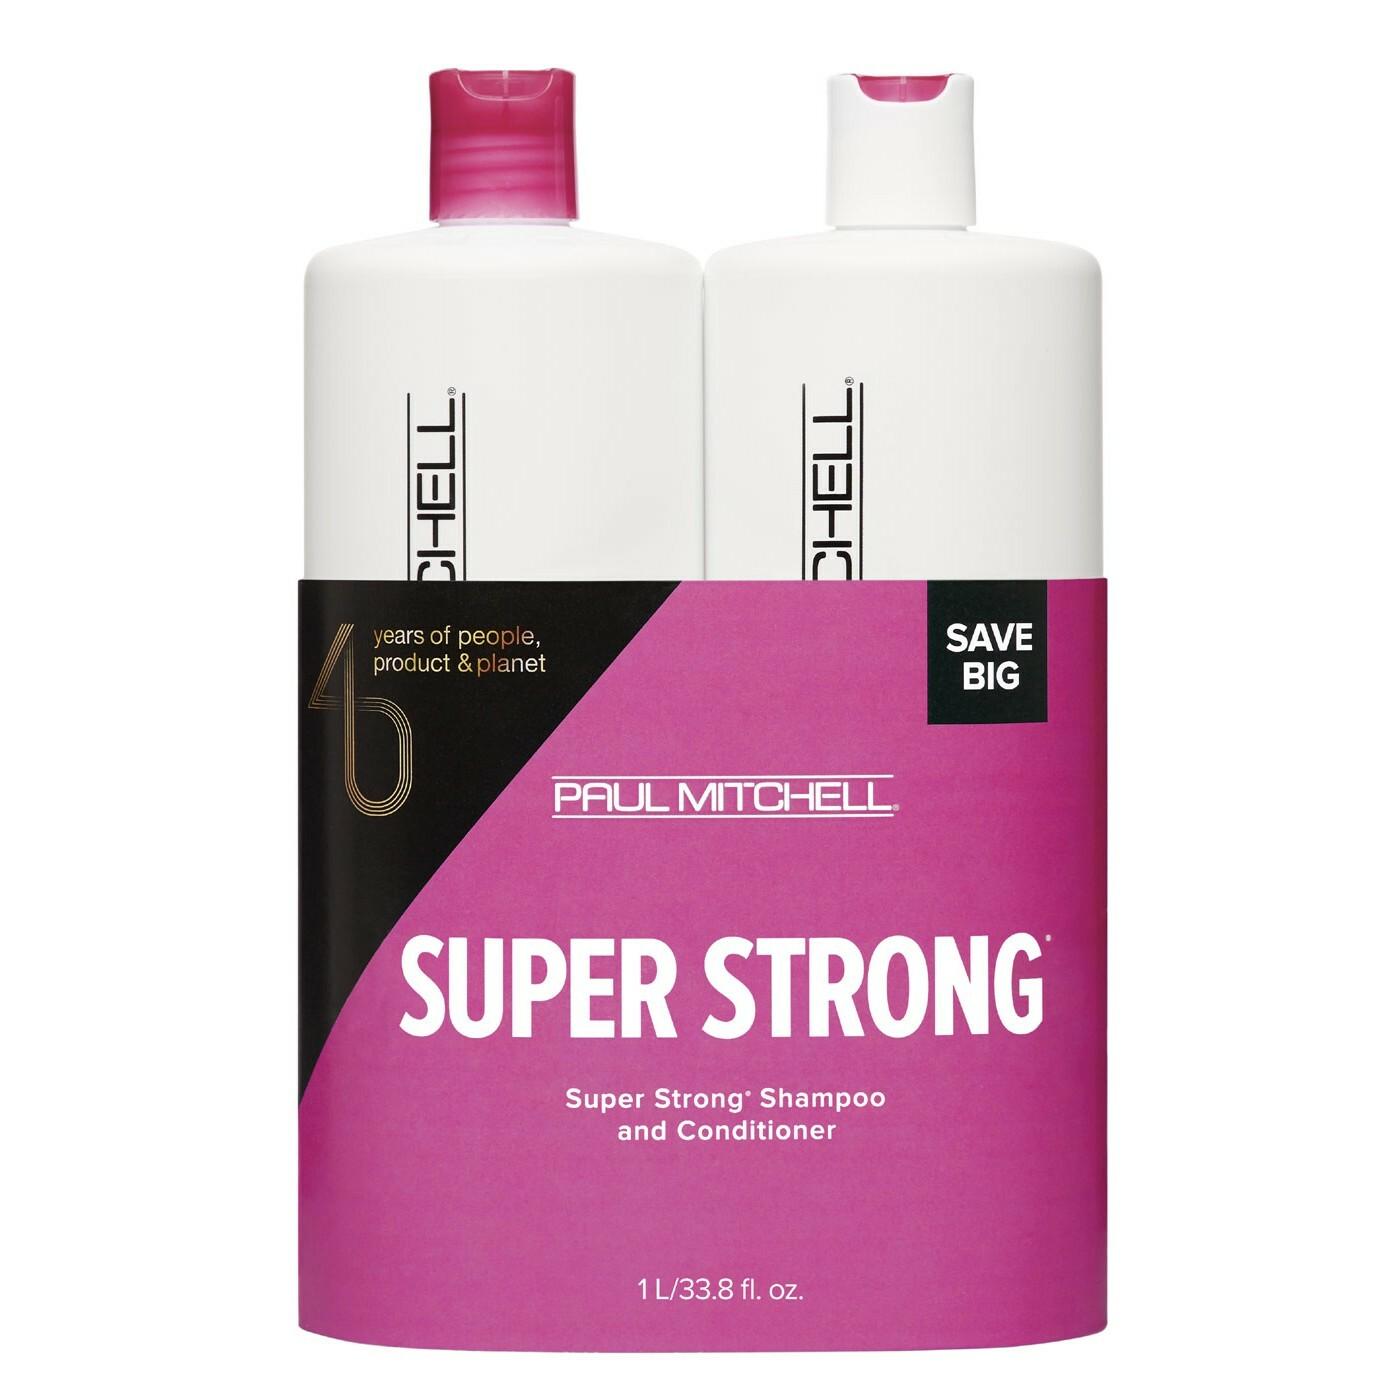 Paul Mitchell Super Strong Strength Set Shampoo 1000 ml + Conditioner 1000 ml